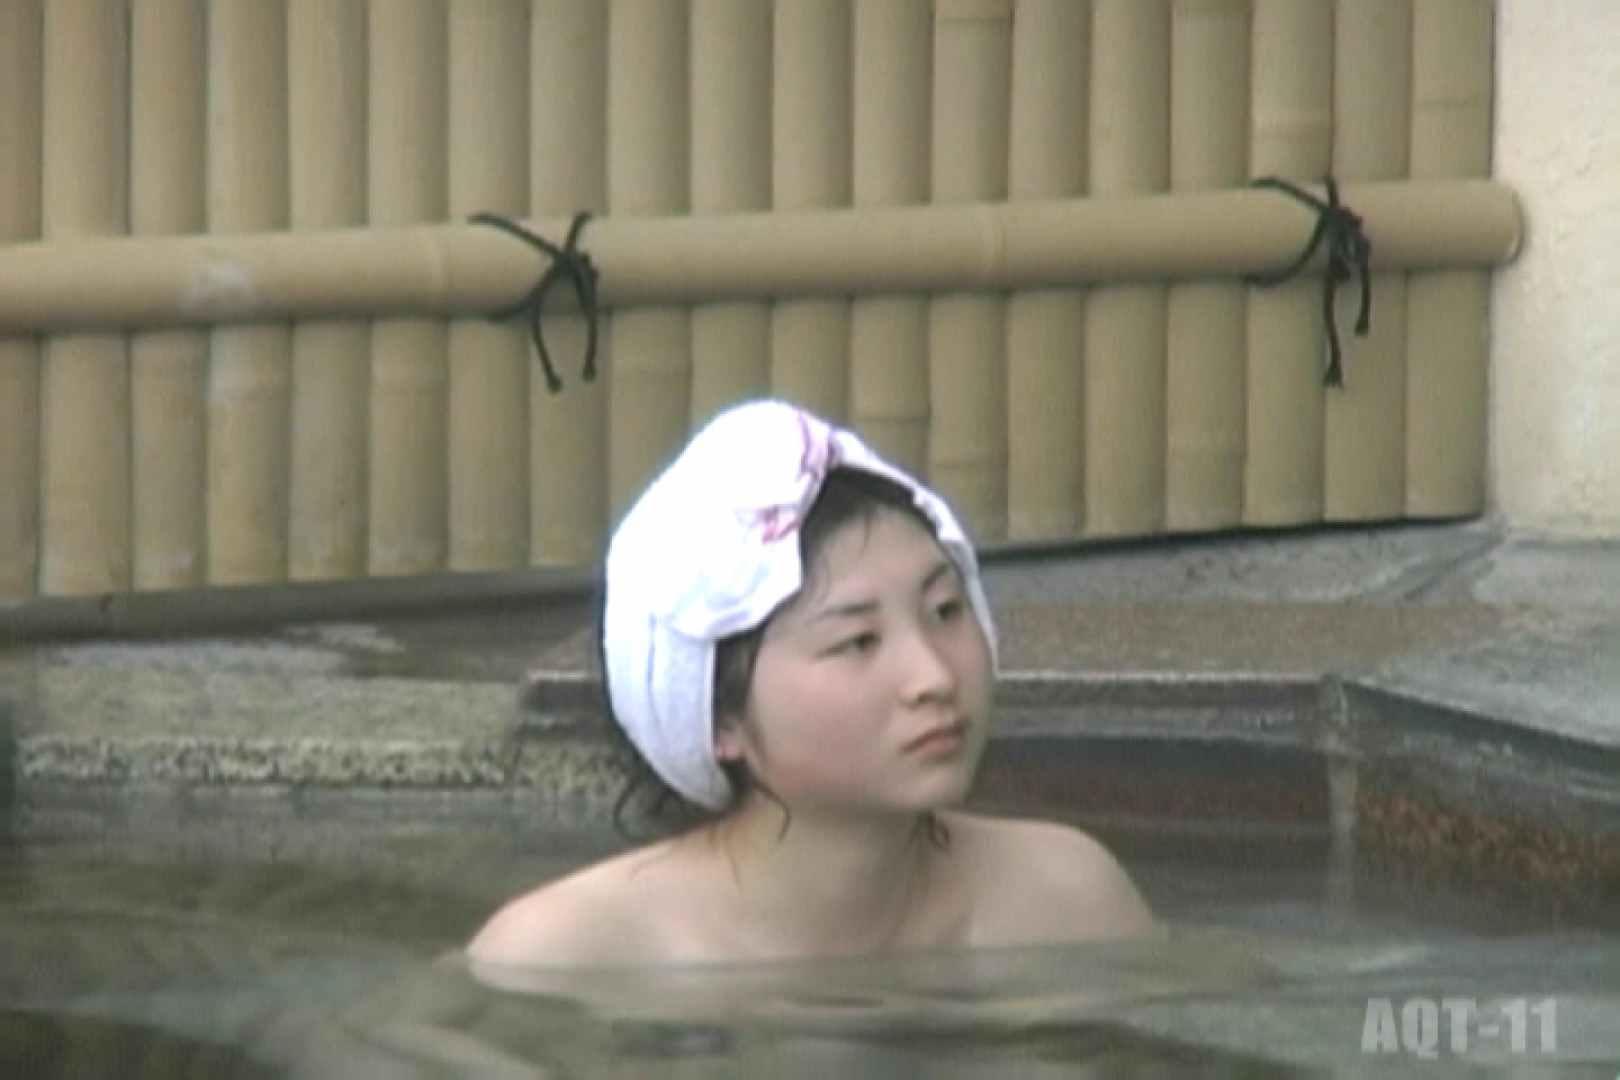 Aquaな露天風呂Vol.801 盗撮 ワレメ無修正動画無料 104枚 104